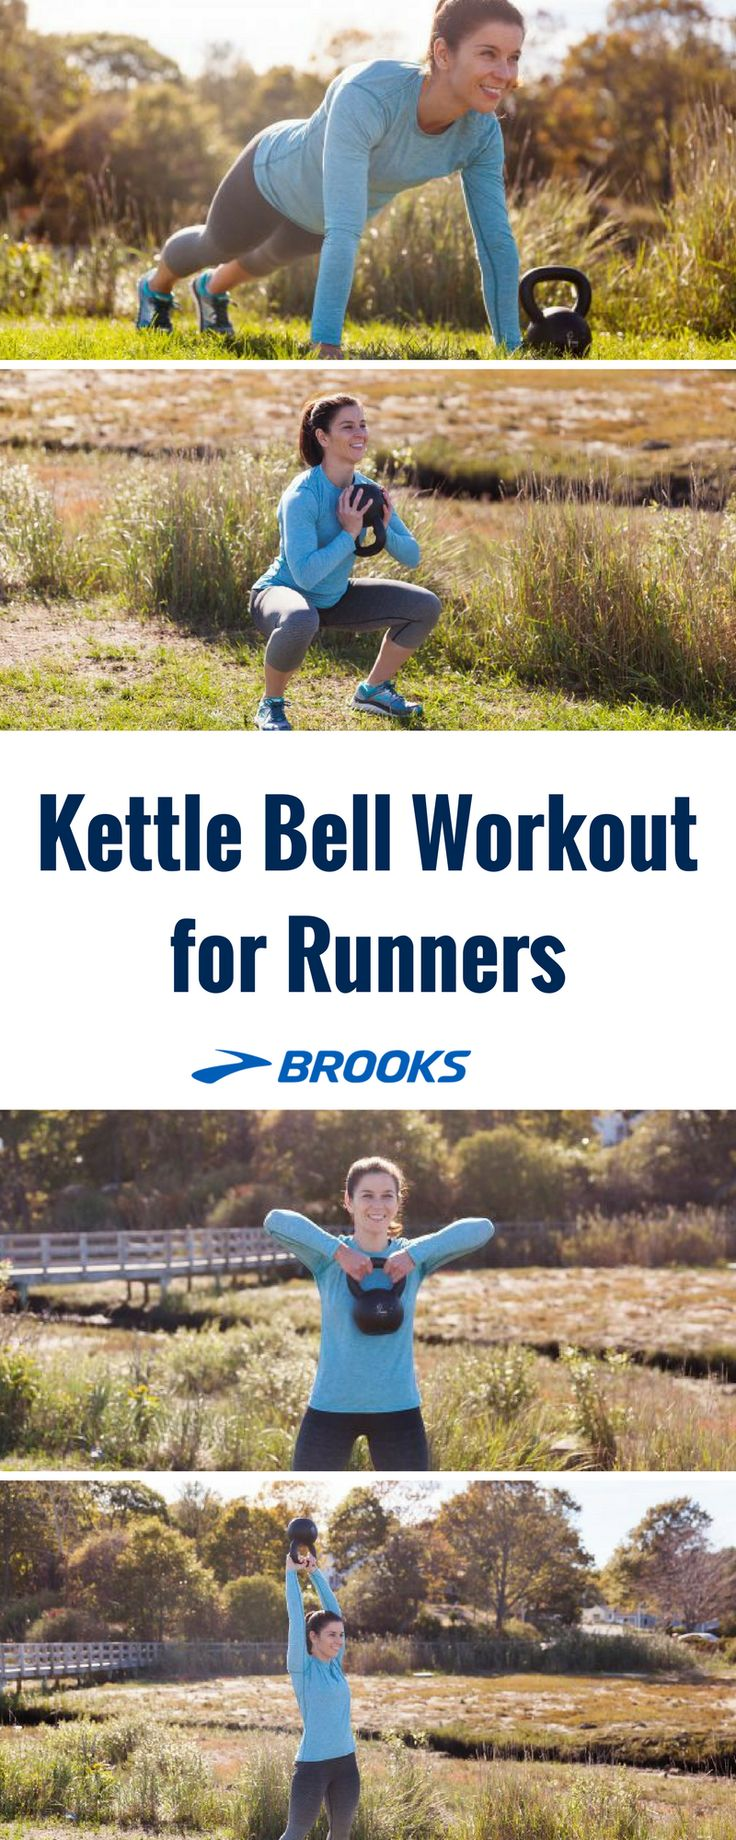 Full Body Kettle Bell Workout For Runners   The Brooks Running Blog  Running Workouts   Running Motivation   Running Tips